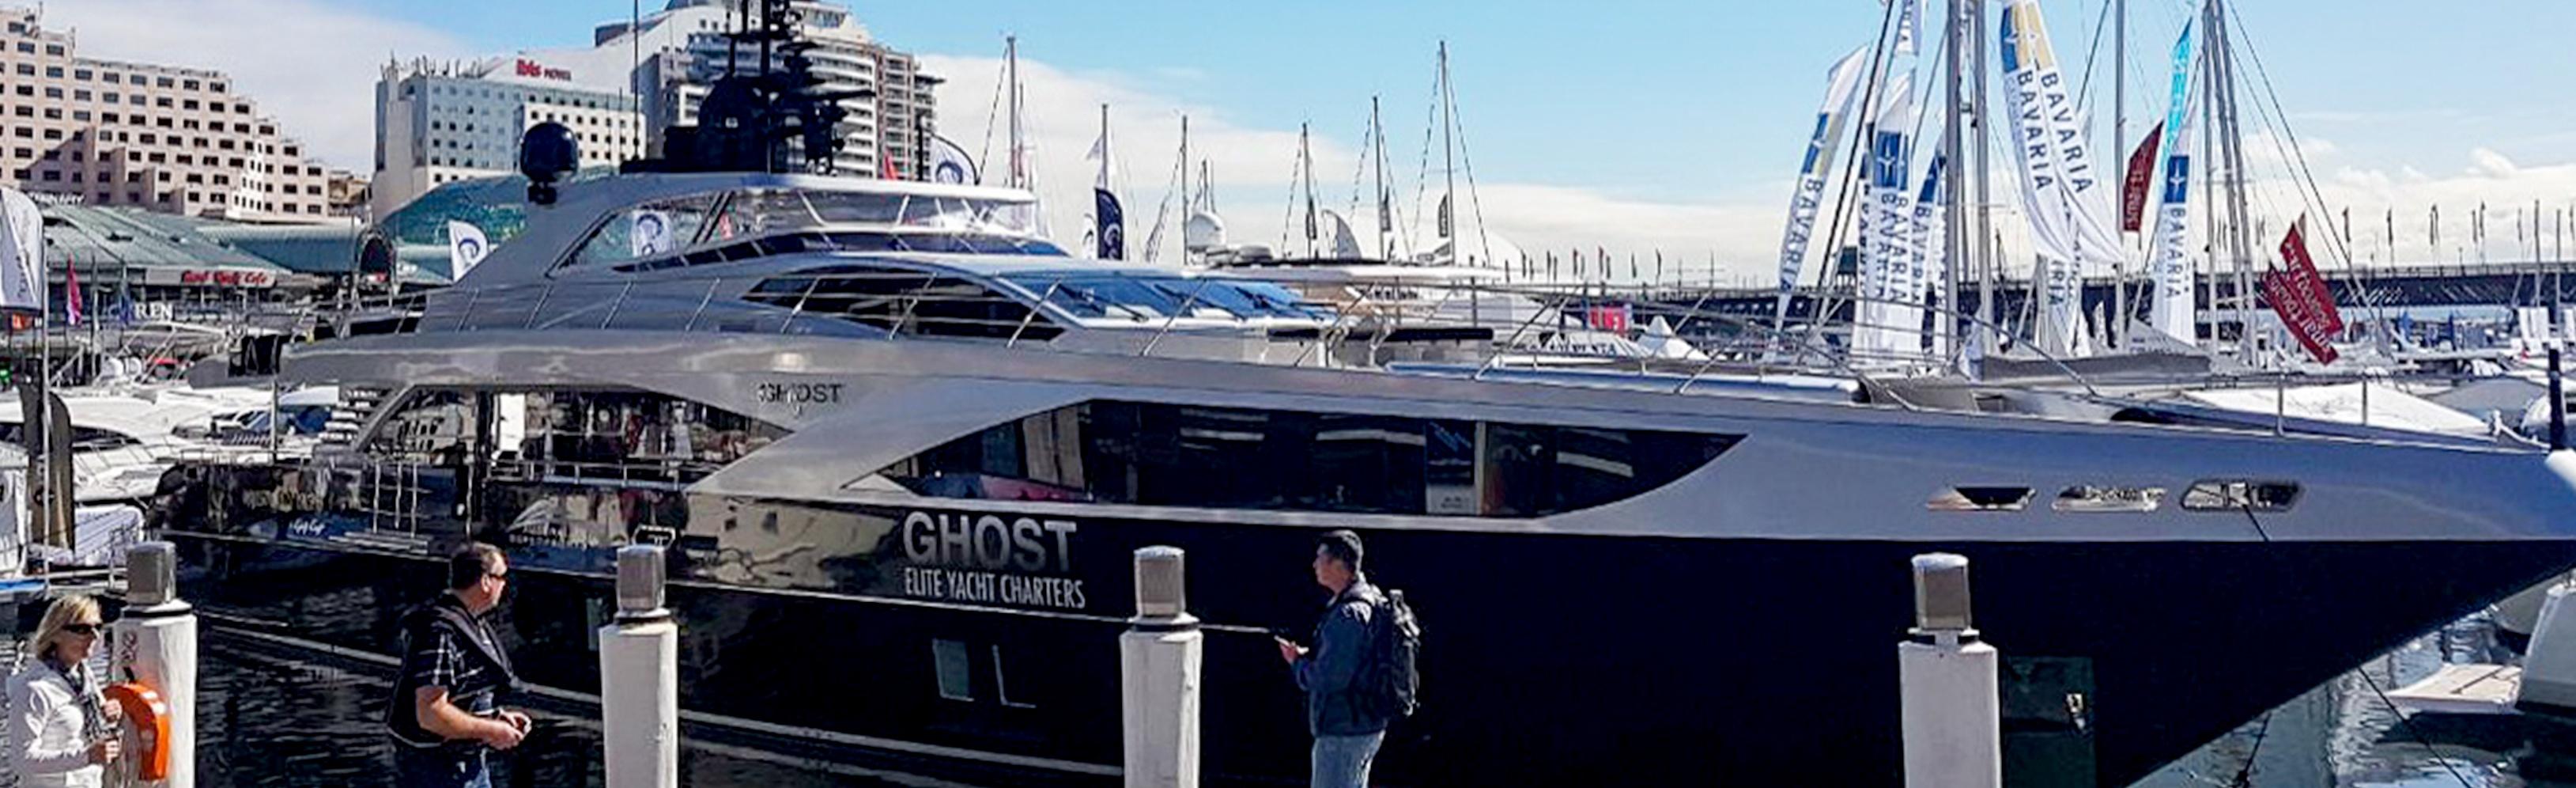 Majesty-122,-Ghost-II,-Sydney-Boat-Show-2017.jpg